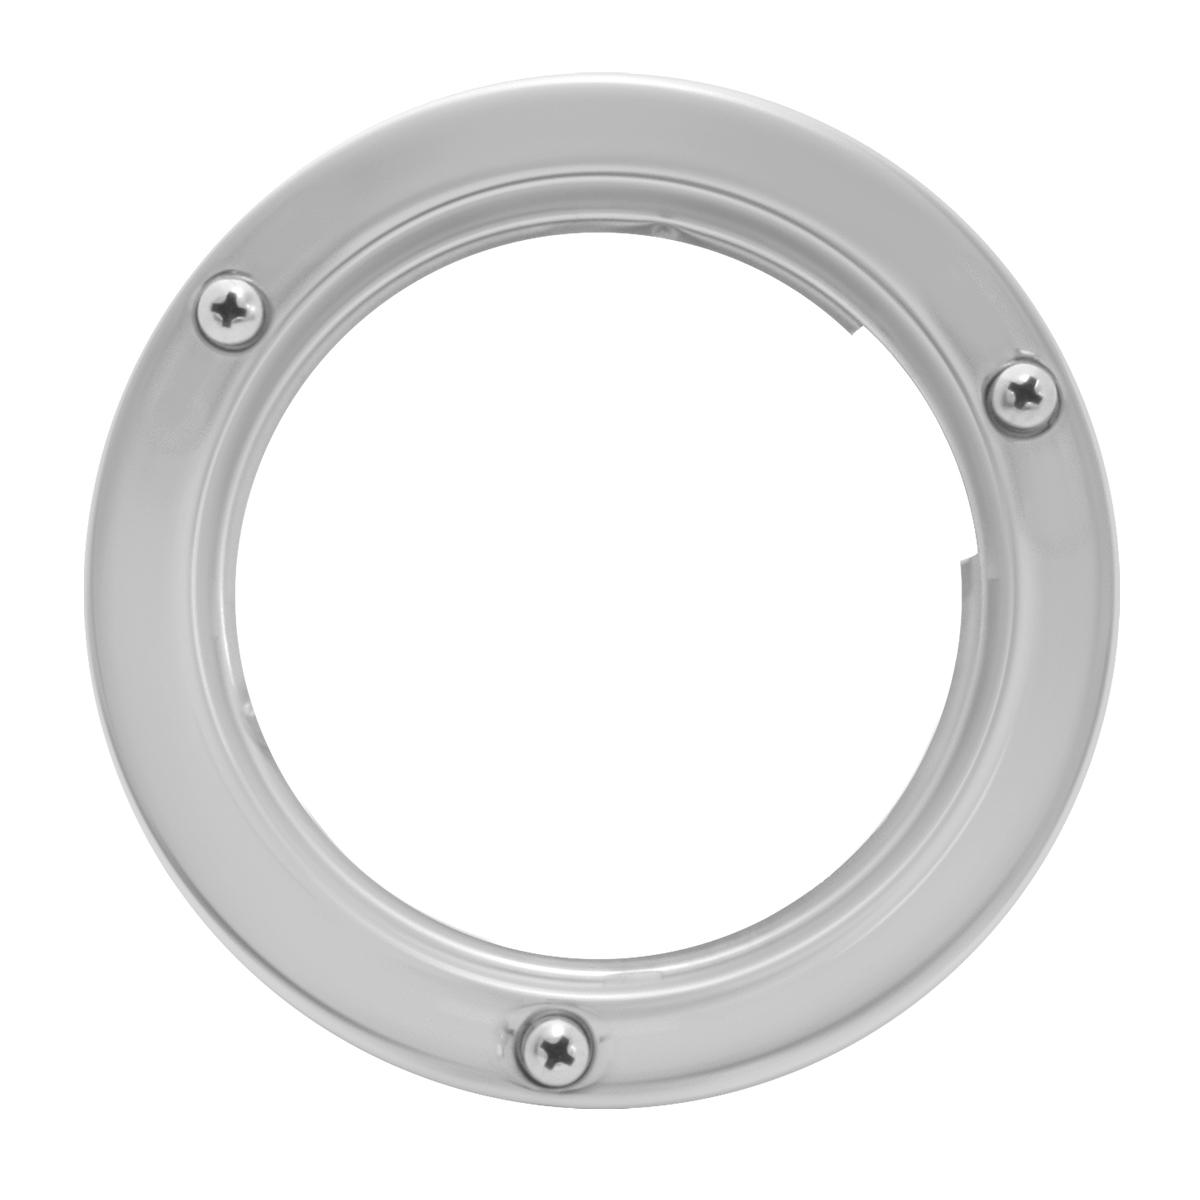 "78279 Stainless Steel Flange Mount Bezel II for 4"" Round Light"